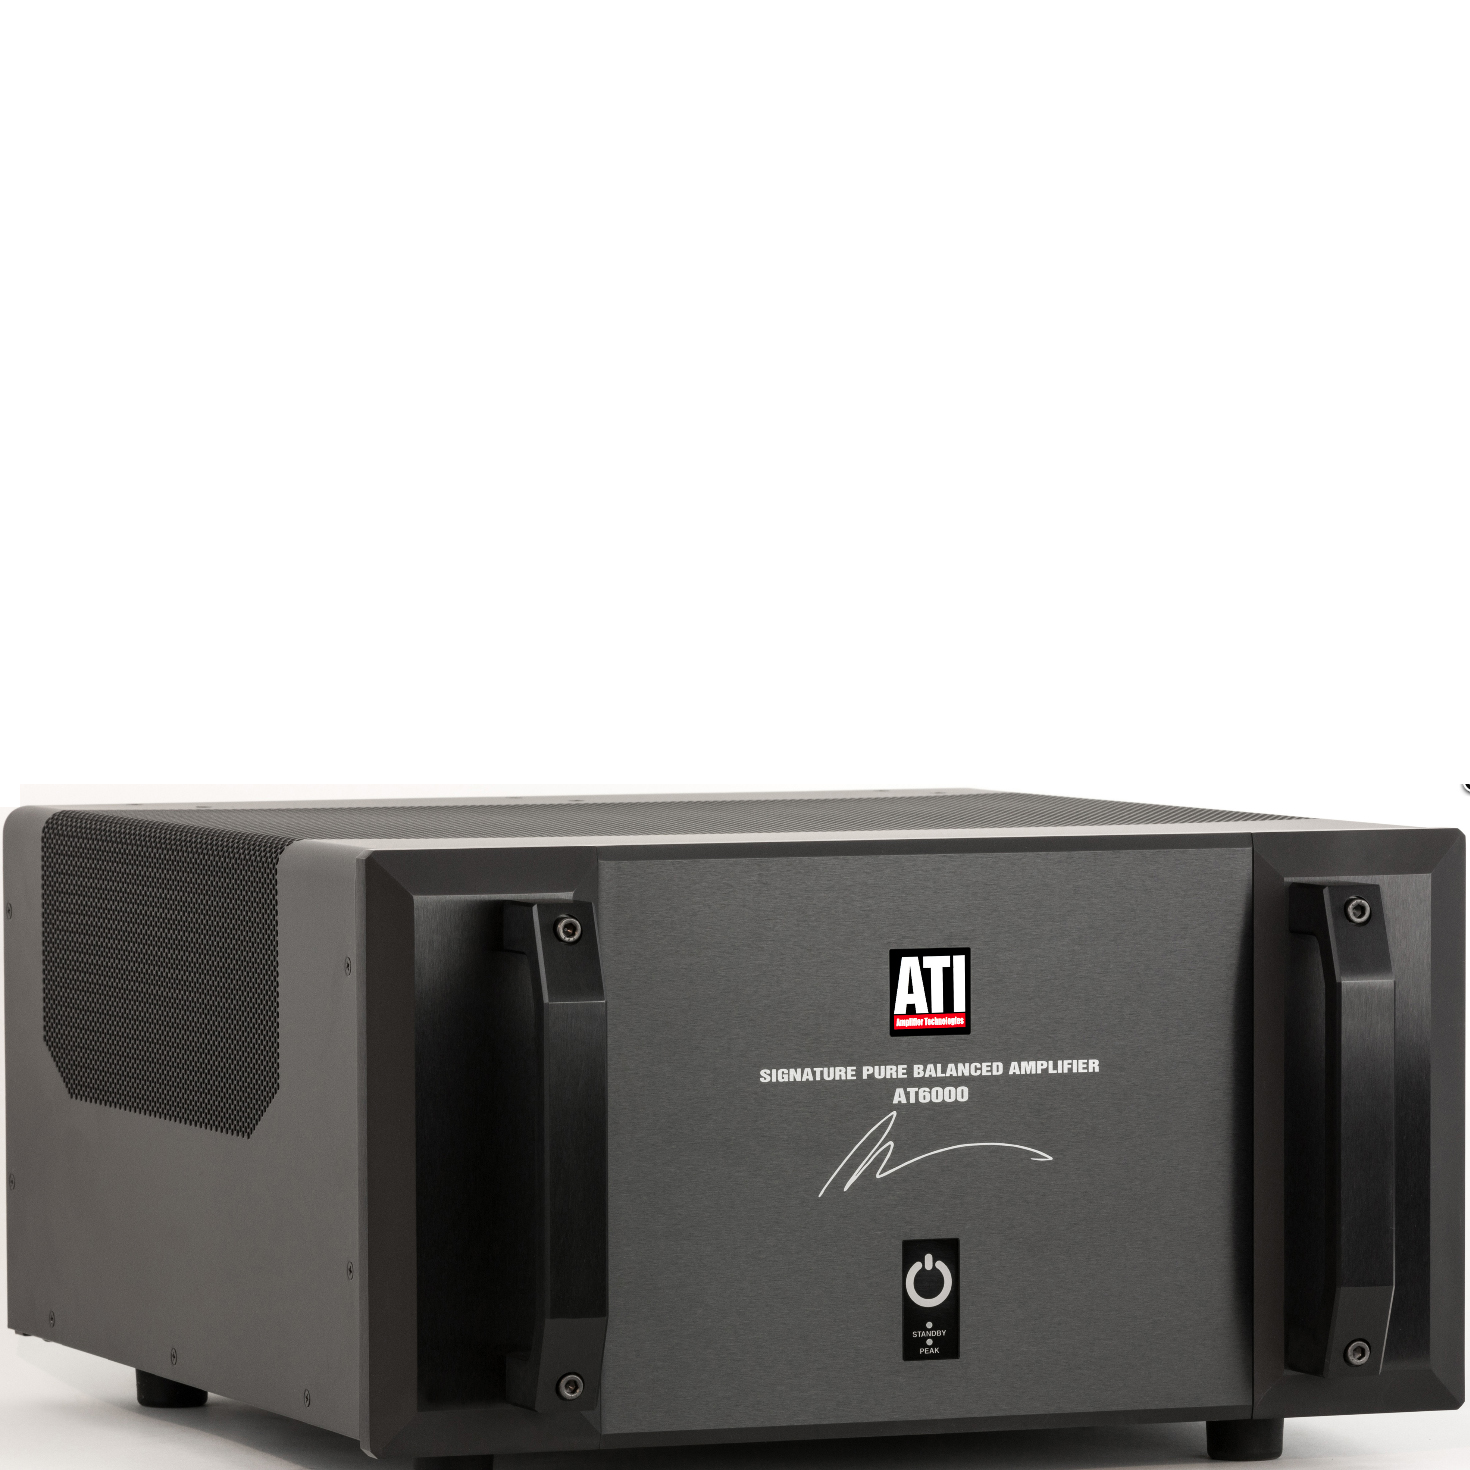 ATI AT 6000 Power Amplifier